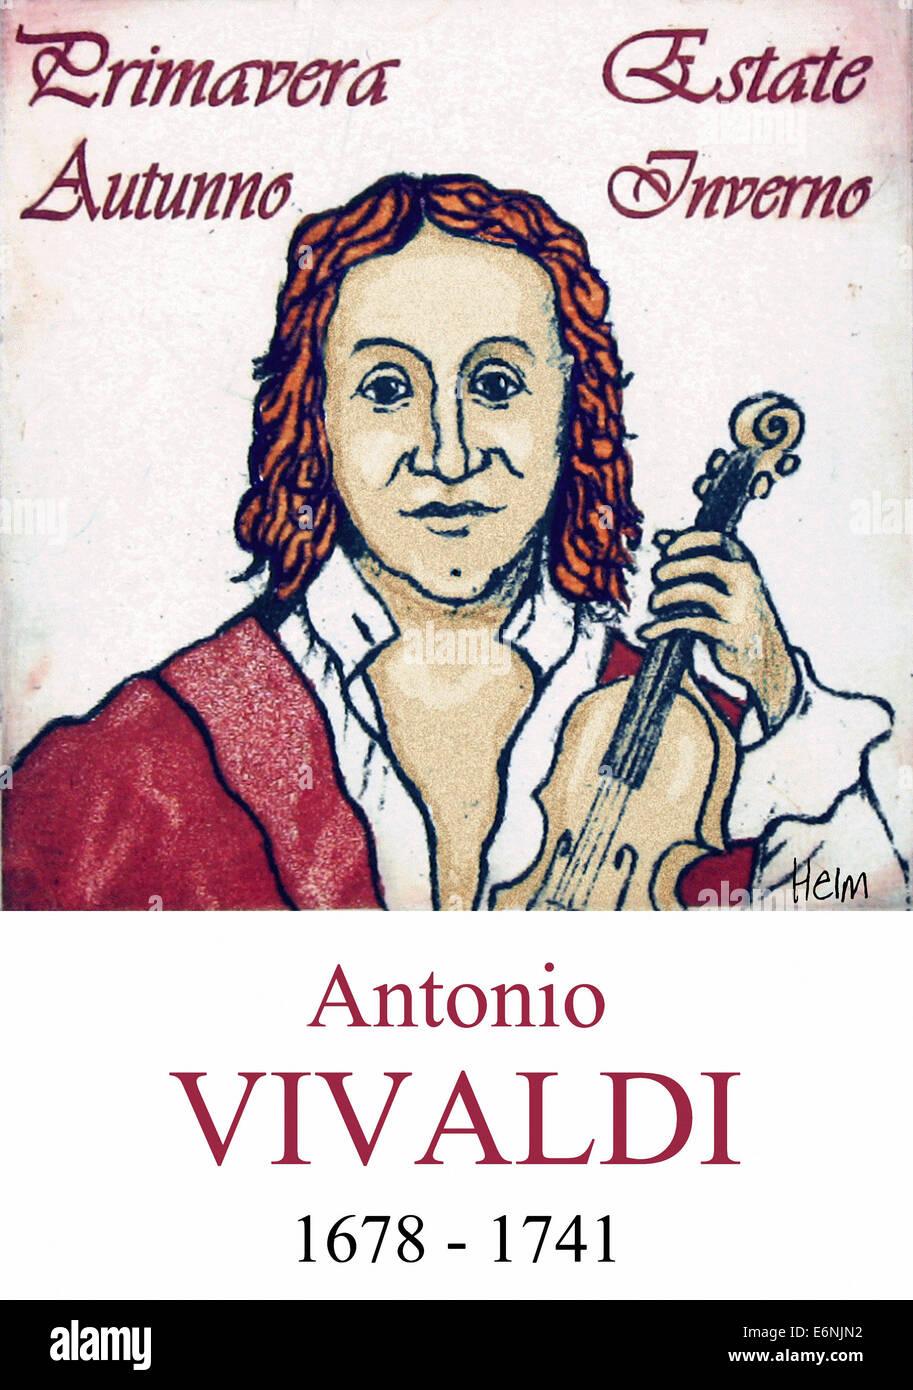 Portrait of Antonio Vivaldi, 1678 - 1741, Italian baroque composer - Stock Image